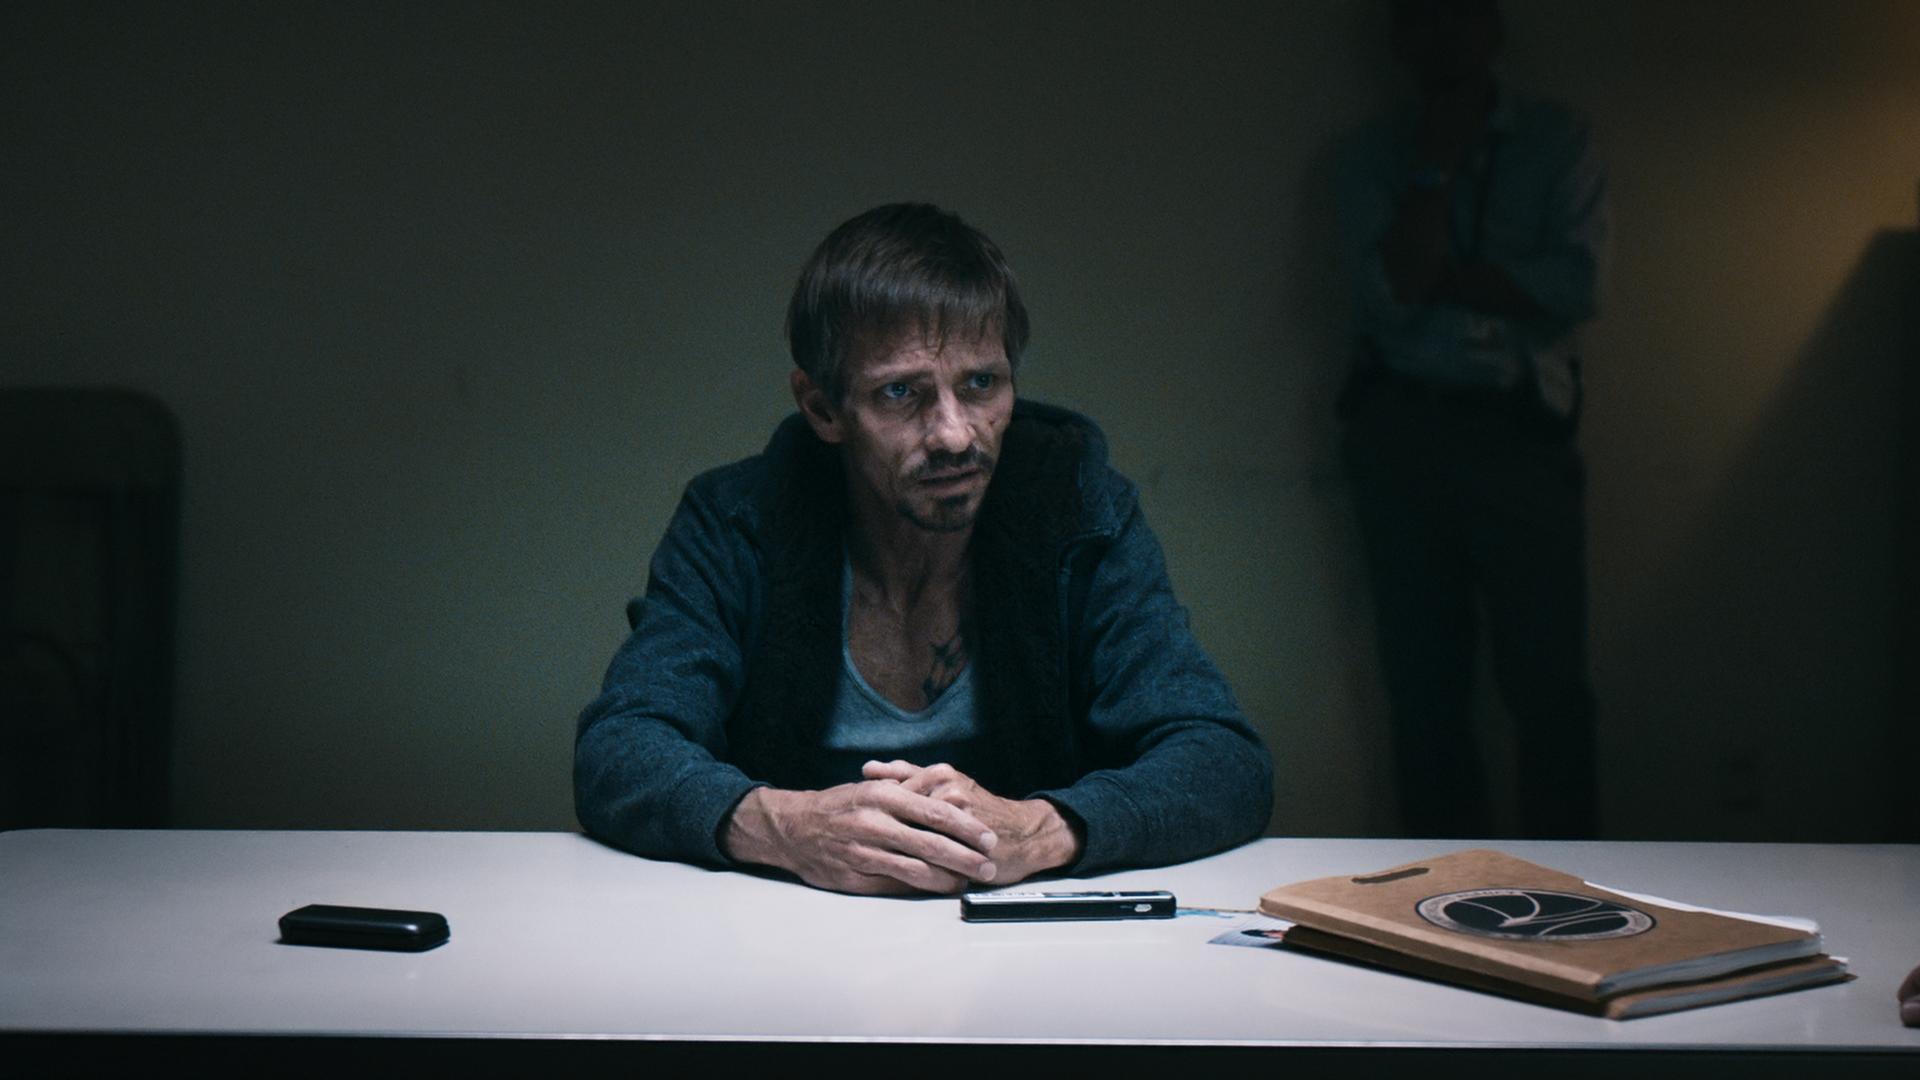 [News] Netflix Announces EL CAMINO: A BREAKING BAD MOVIE